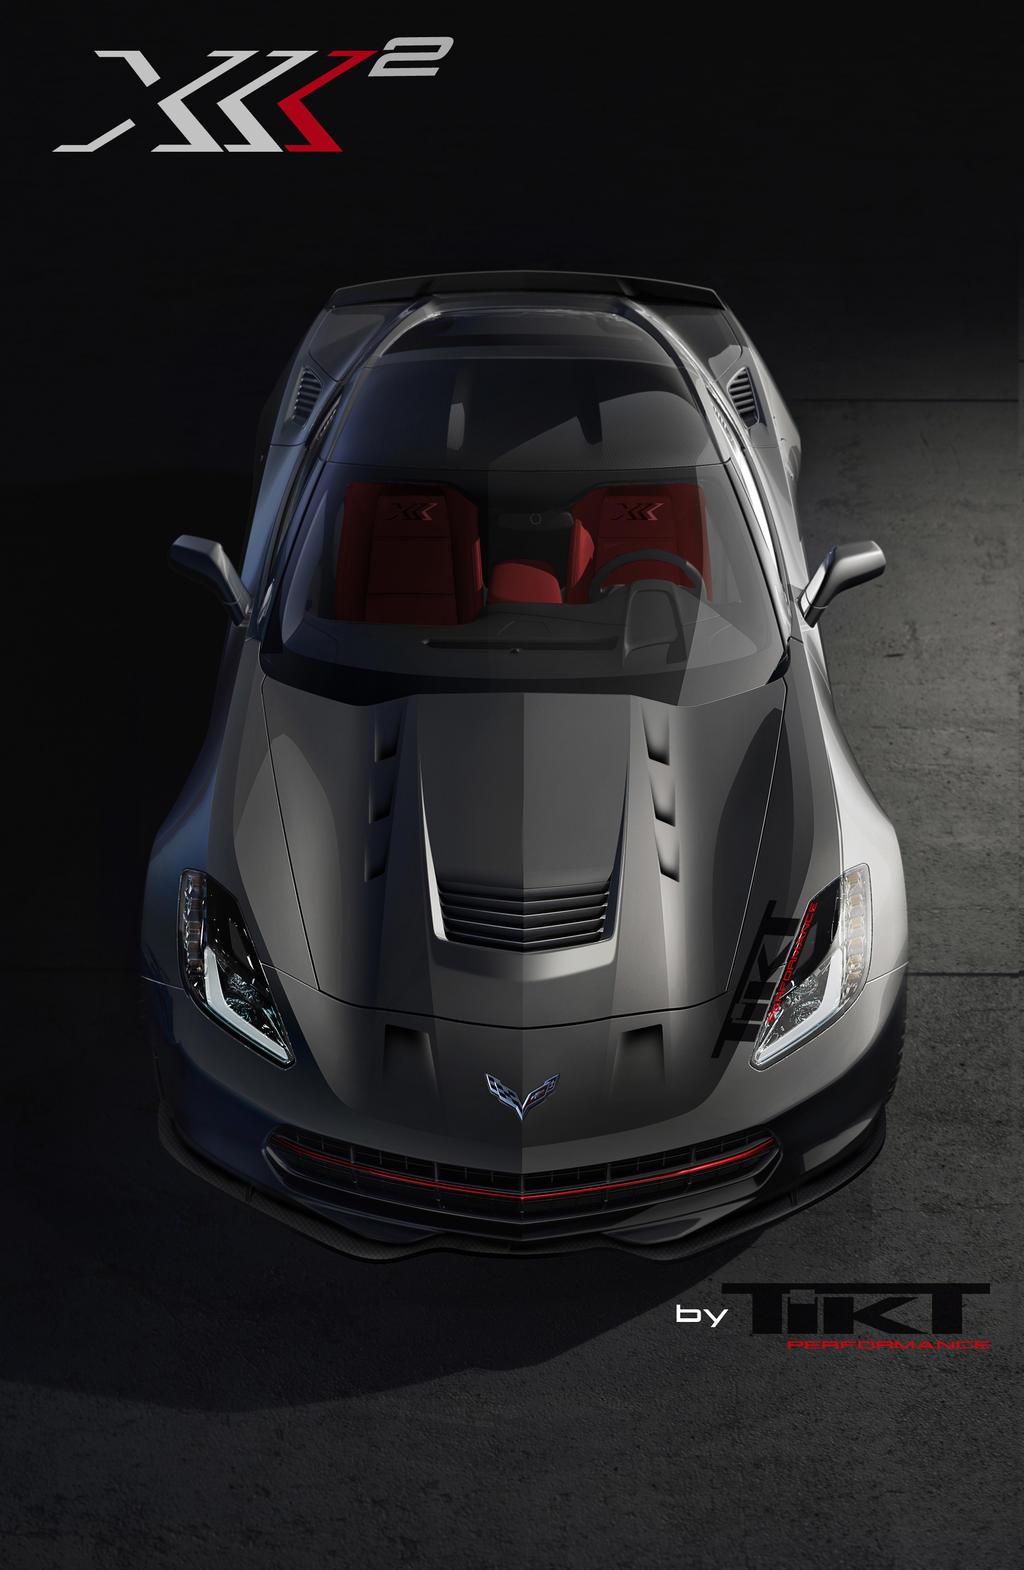 Die Neue Corvette C7 Seite 5 Zroadster Com Bmw Z1 Z2